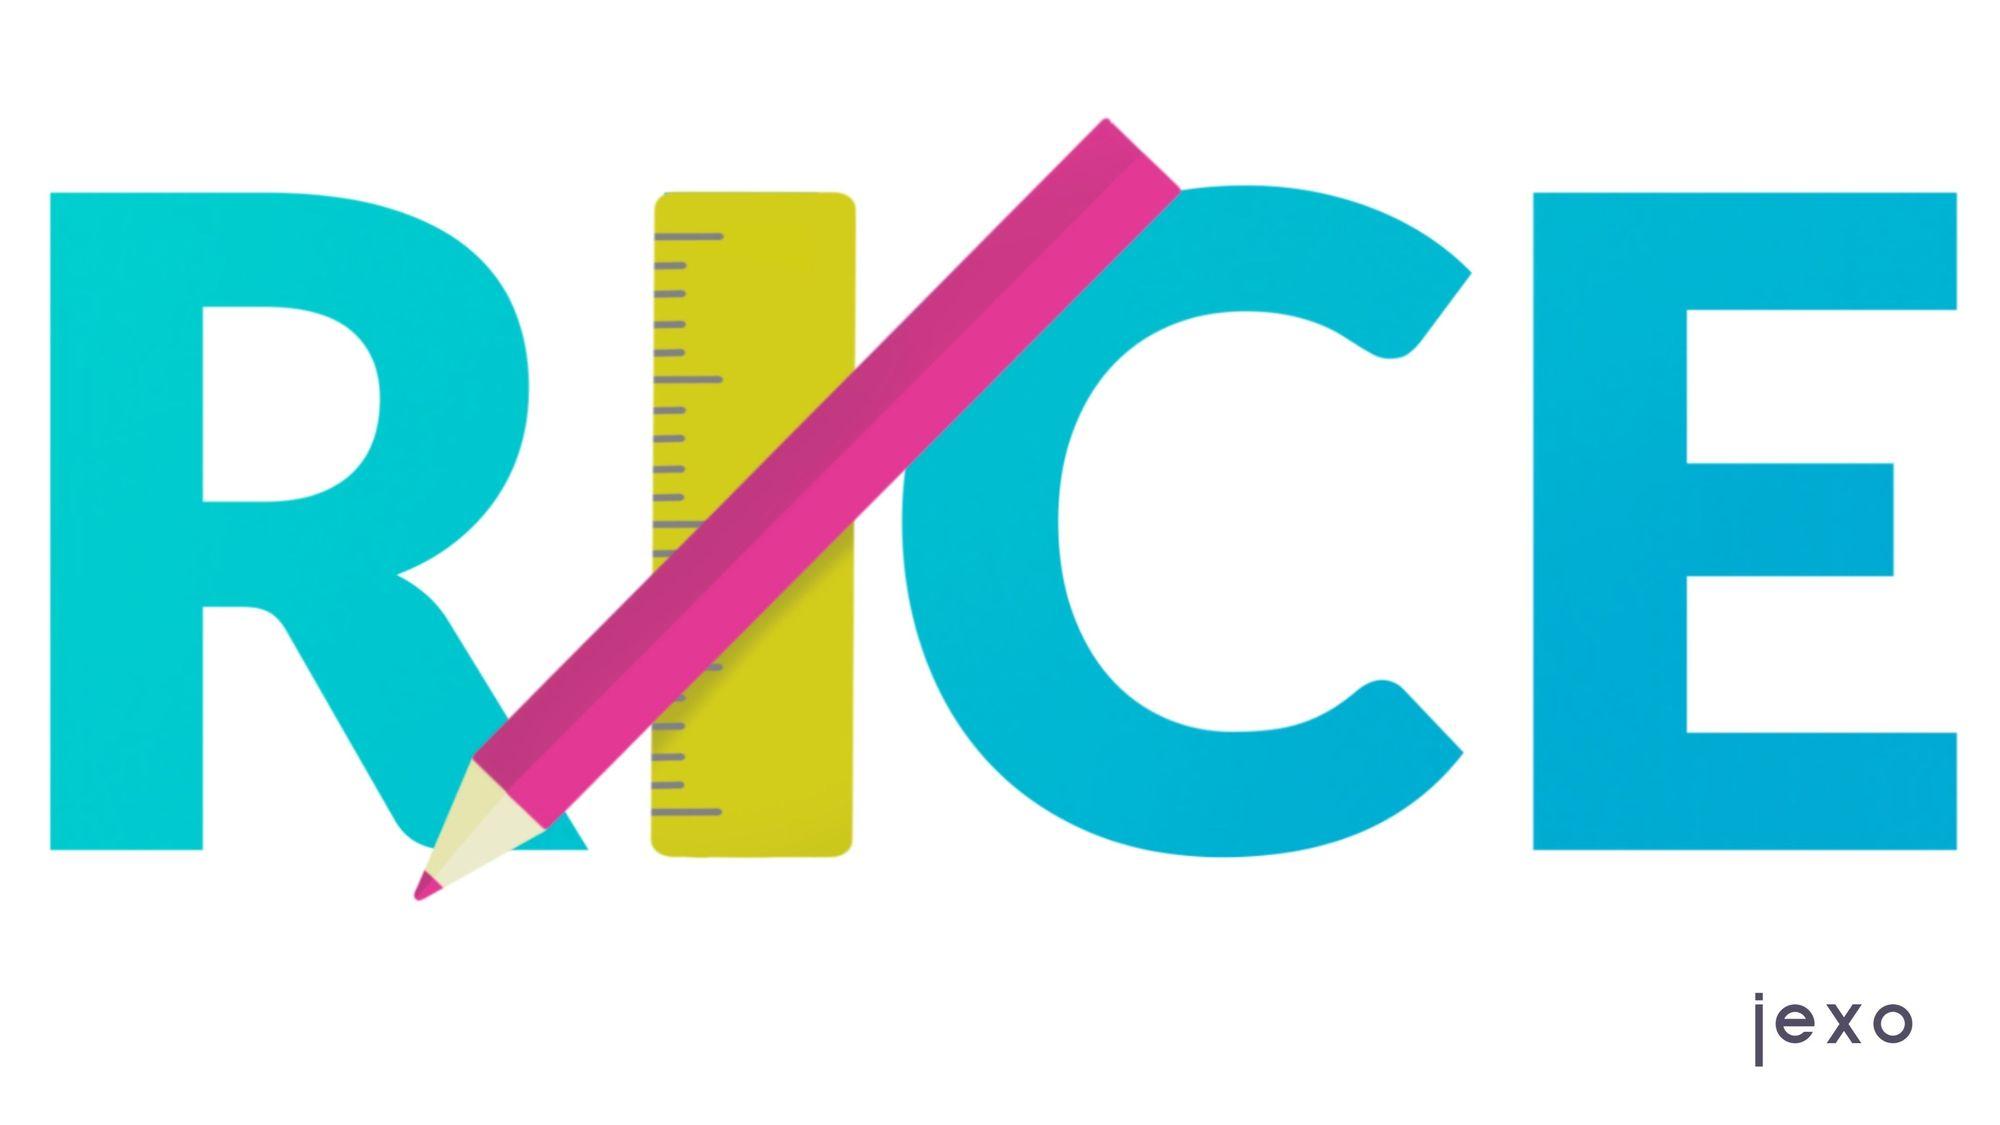 backlog prioritization tool: RICE